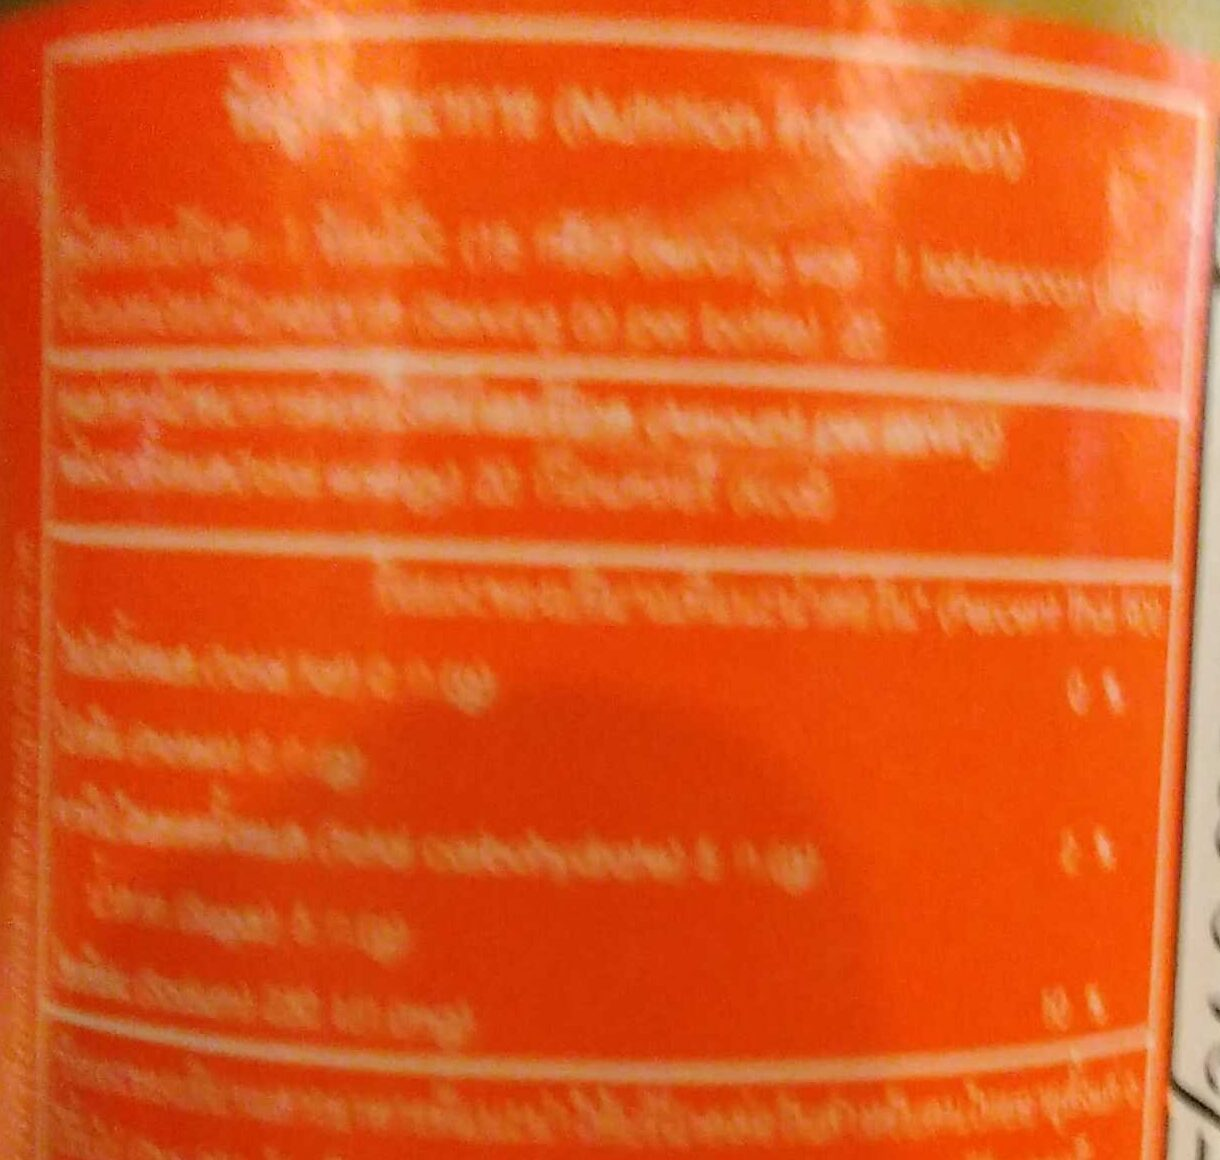 chilly sauce Rosa - Valori nutrizionali - en